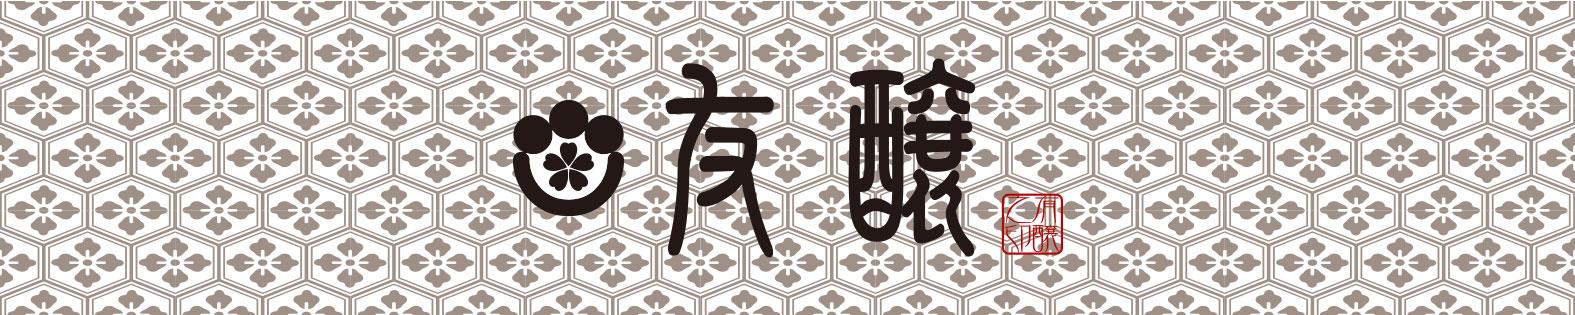 【日本酒】美丈夫 純米大吟醸 舞 生酒 しずく媛50 限定 新酒27BY_e0173738_1094060.jpg